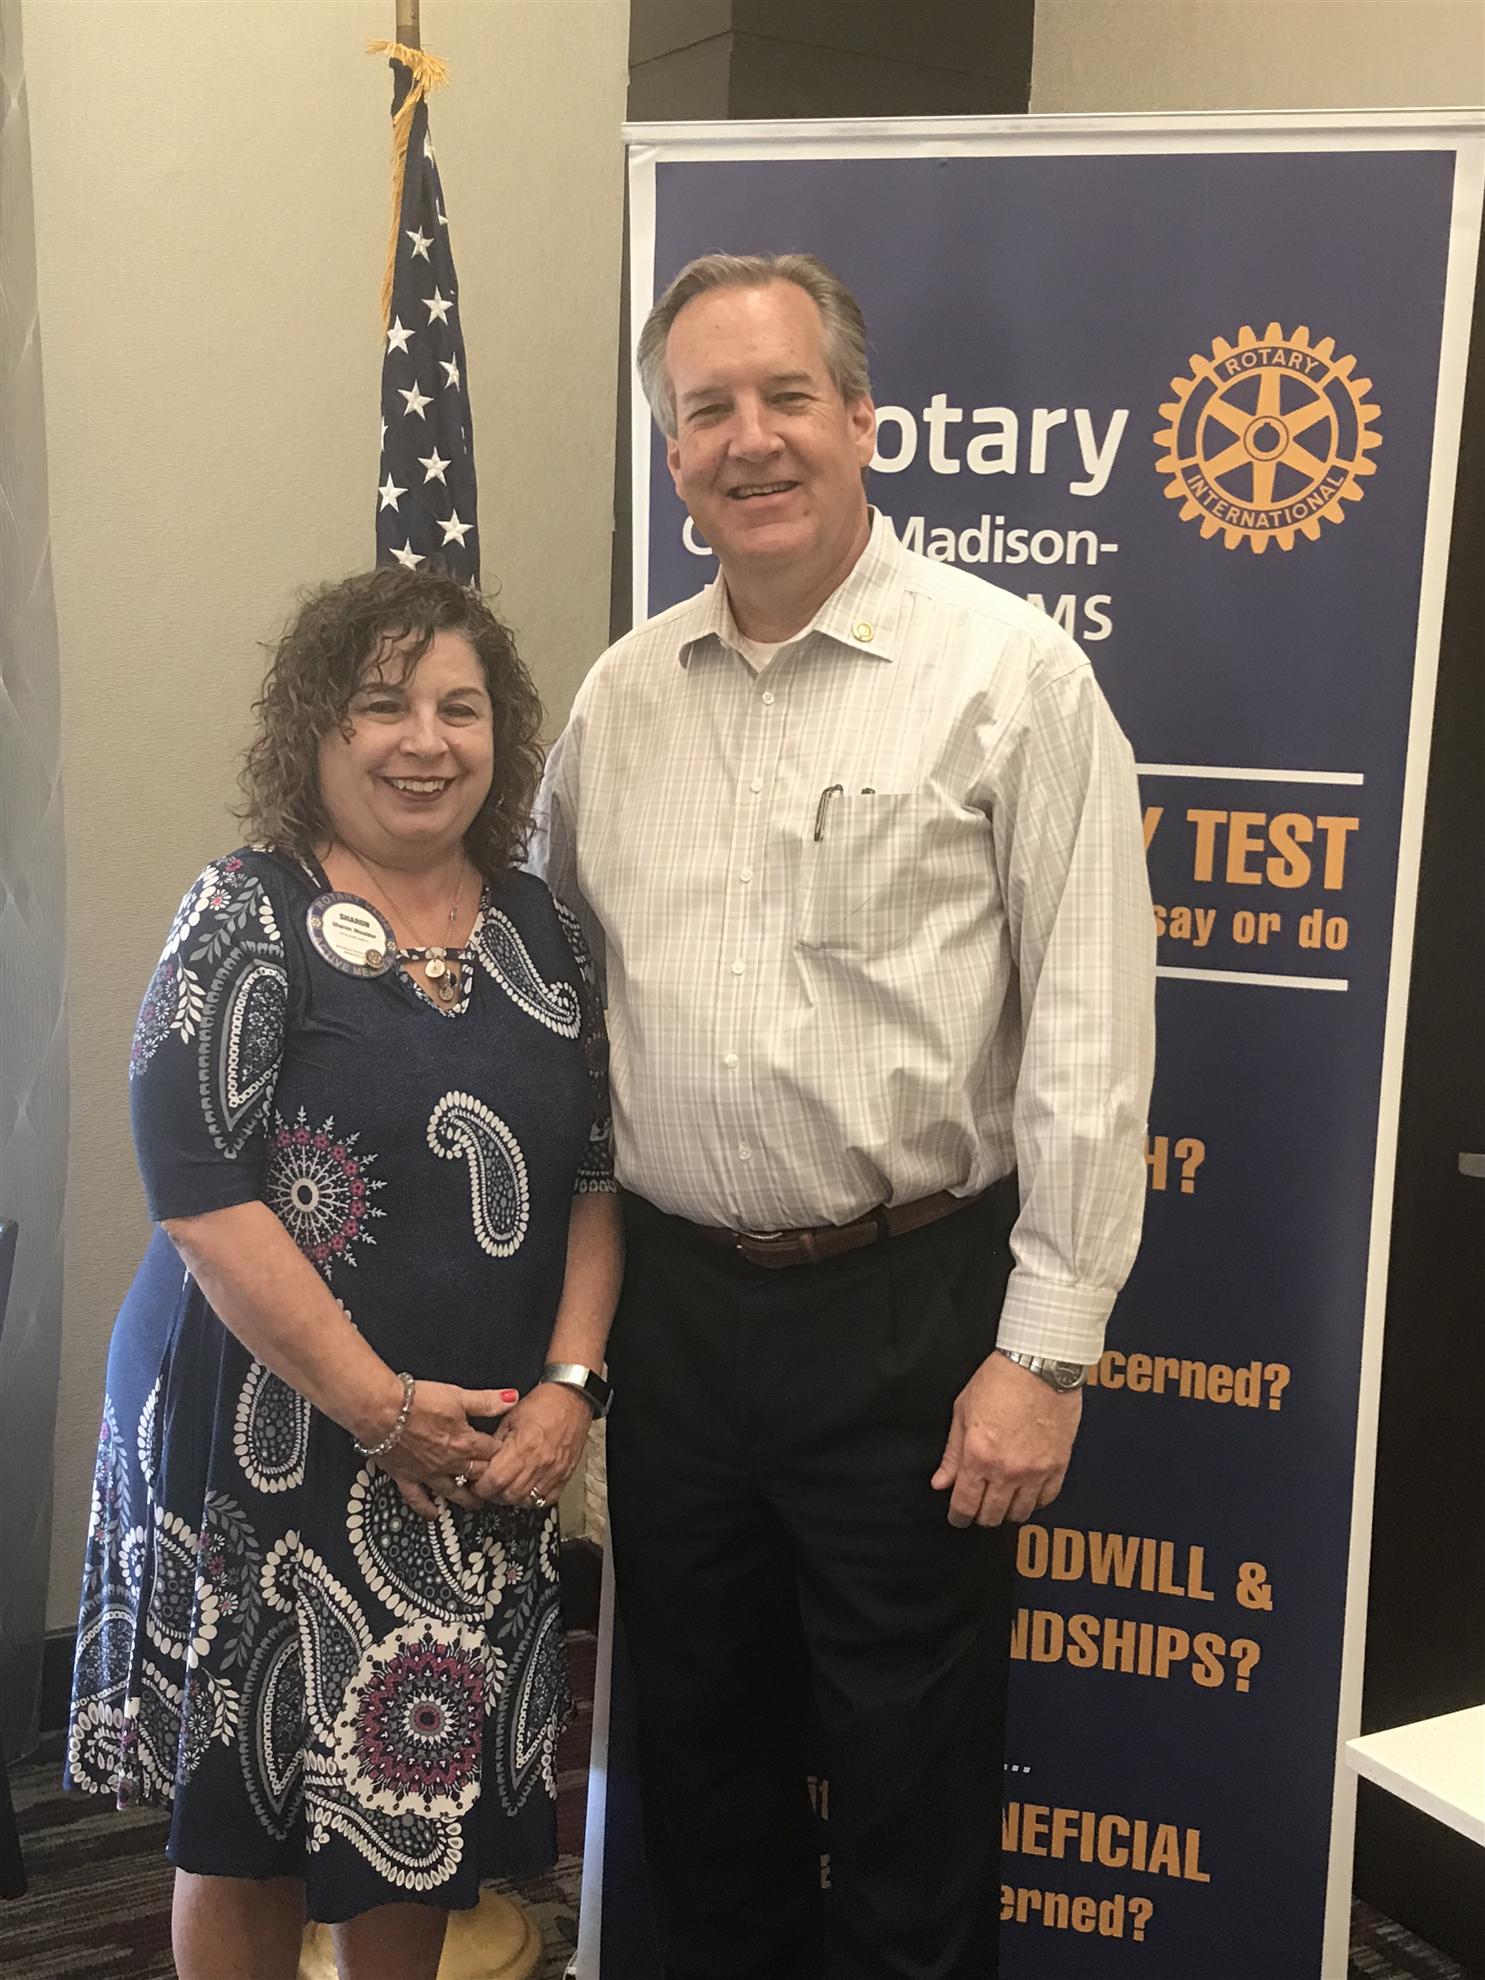 Stories   Rotary Club of Madison-Ridgeland